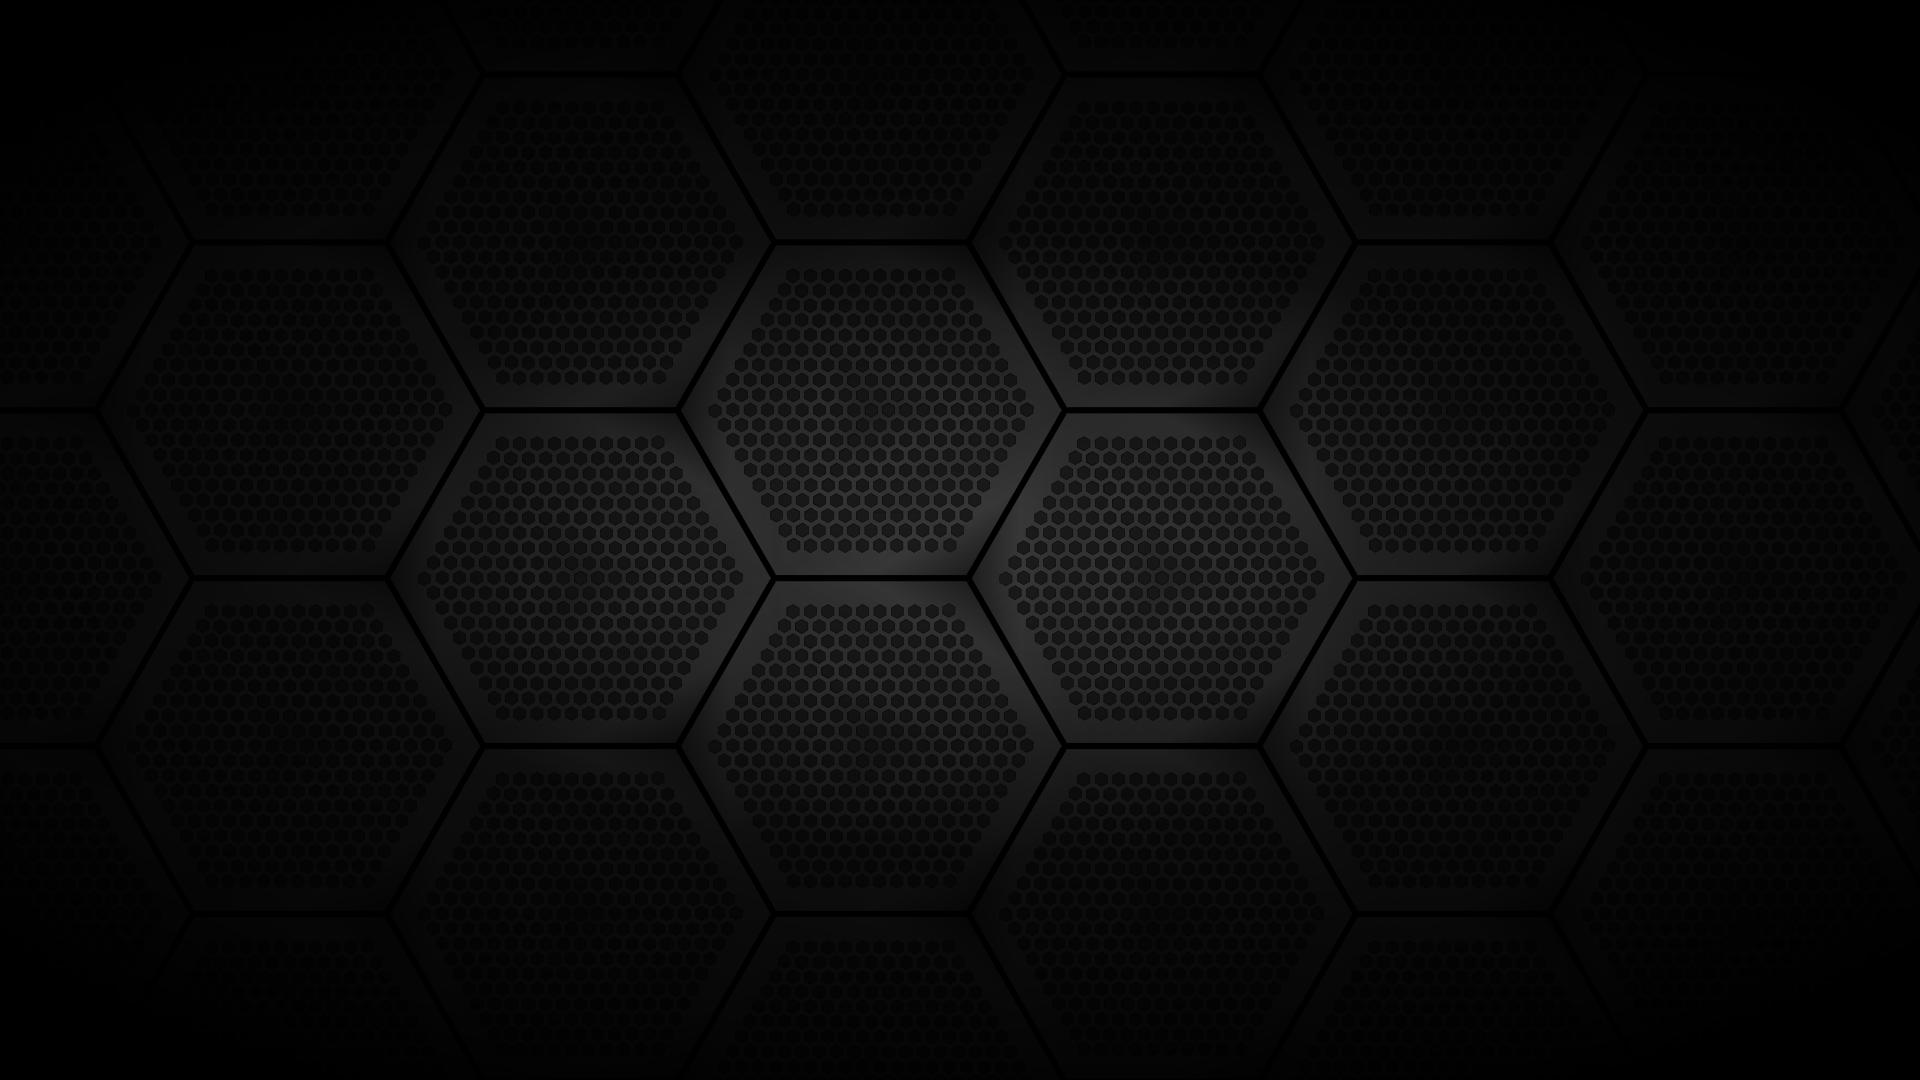 hexagons textures grid chrome digital art nanosuit